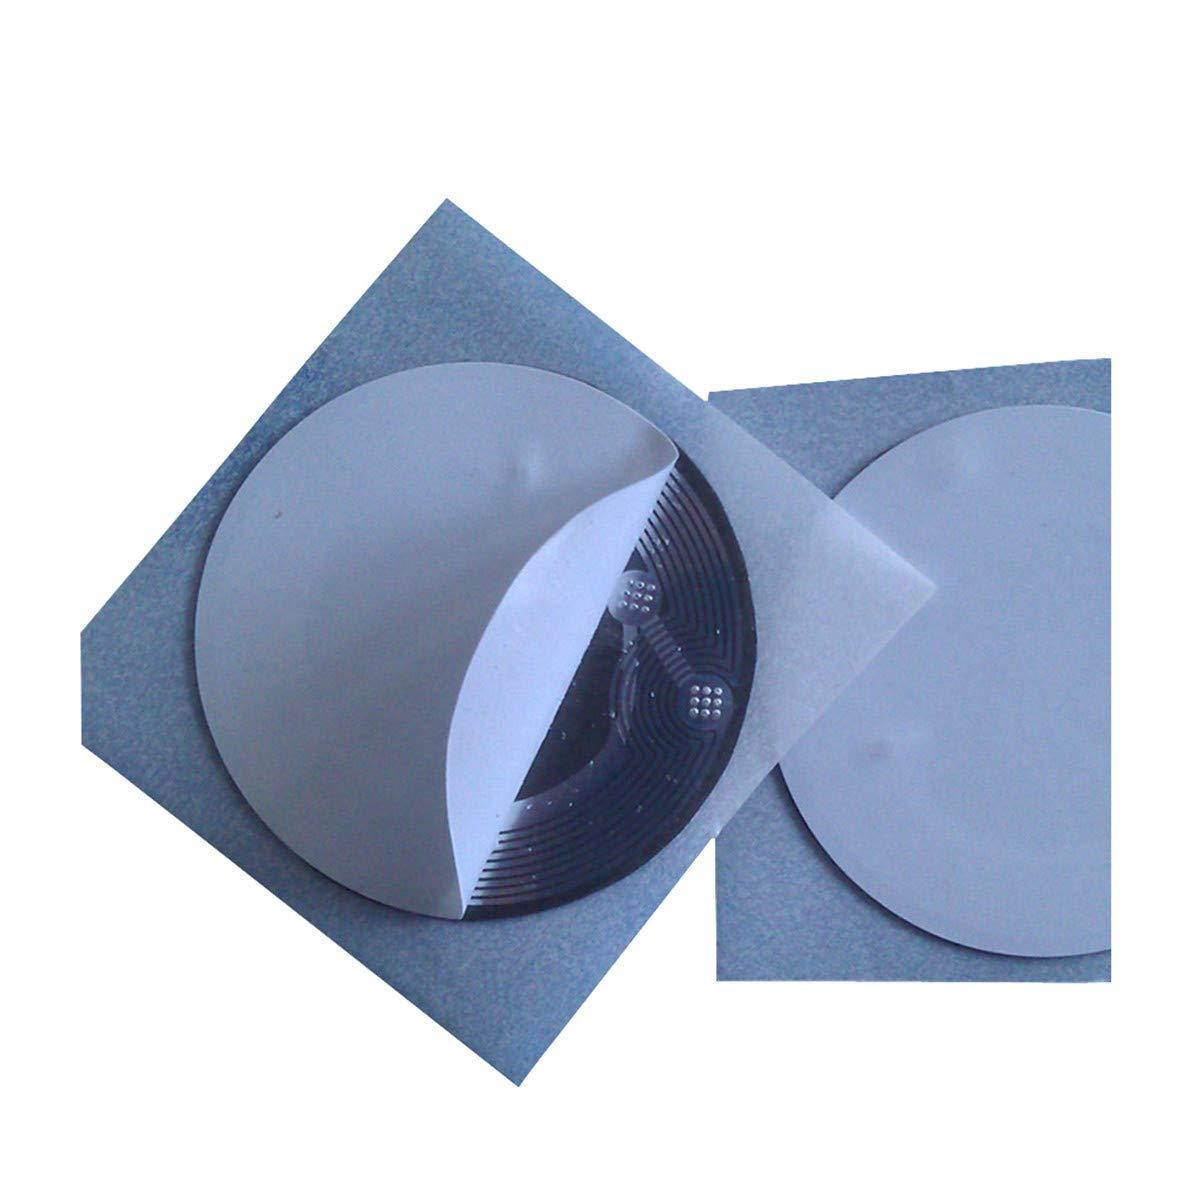 8 x Adhesivo de NFC RFID anti-metal en metal Tag Etiqueta MIFARE Classic® 1K 13, 56 MHz 25 mm de diámetro 56 MHz 25 mm de diámetro YARONG